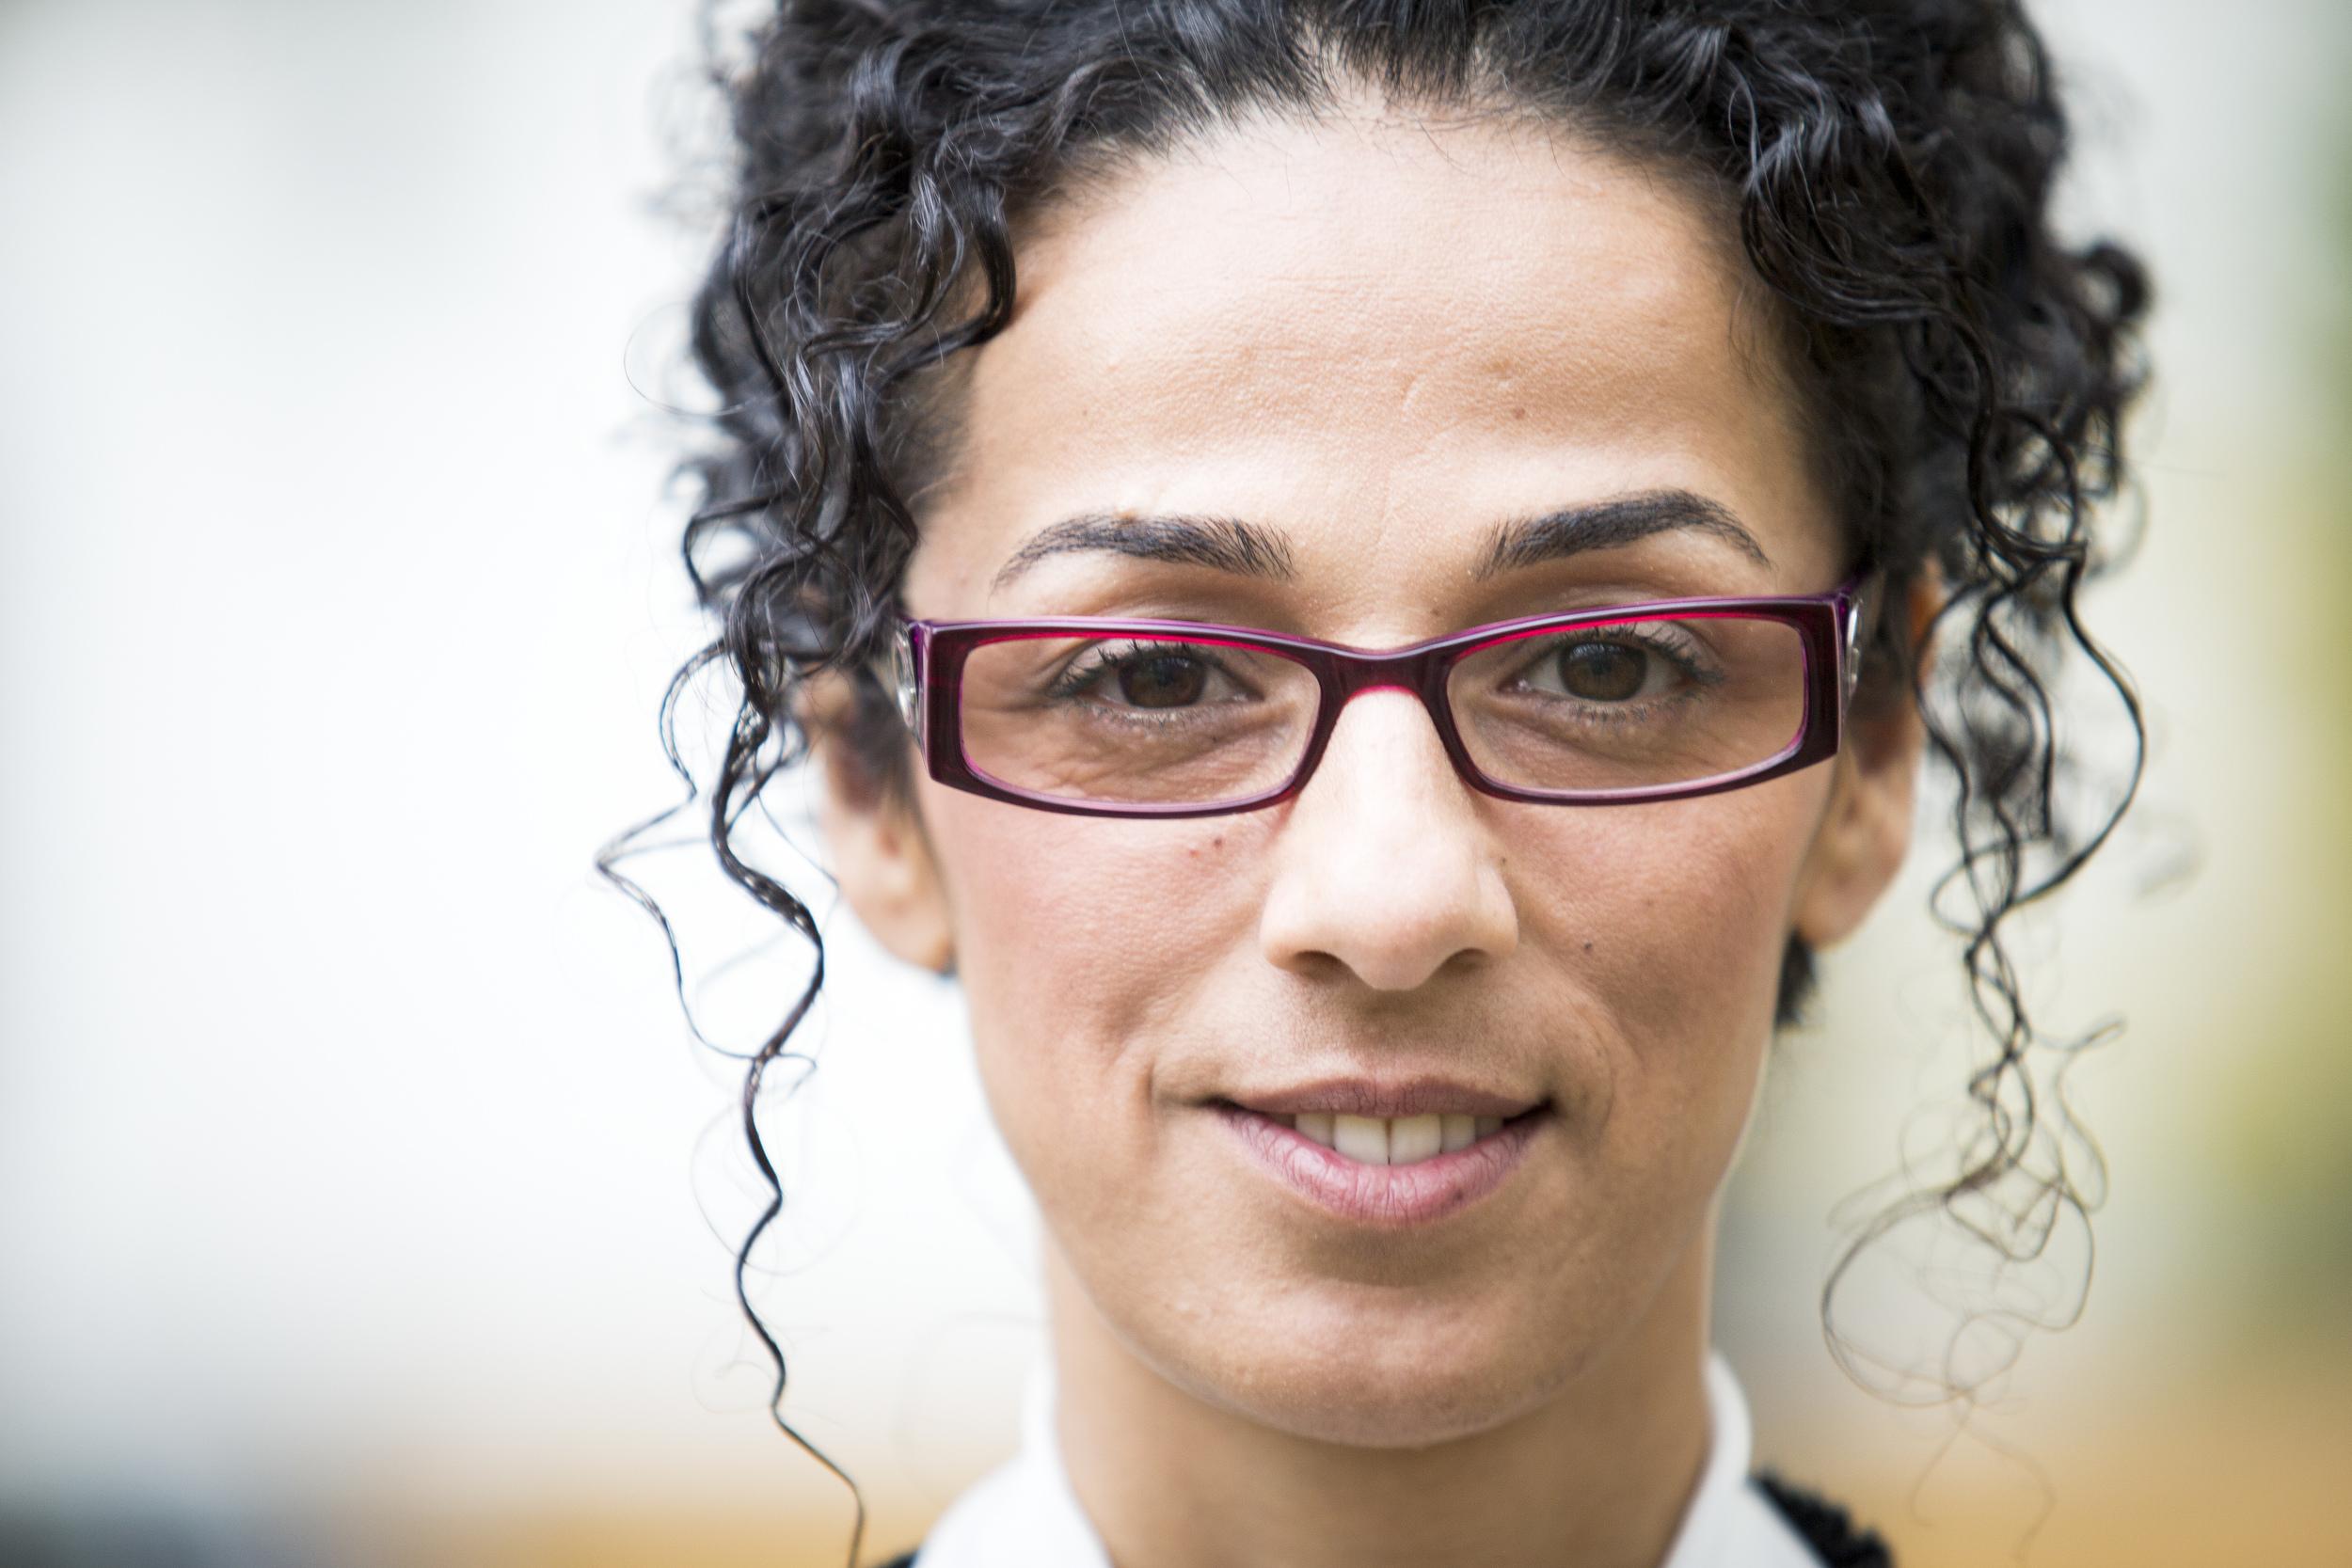 Iranian Facebook activist Masih Alinejad